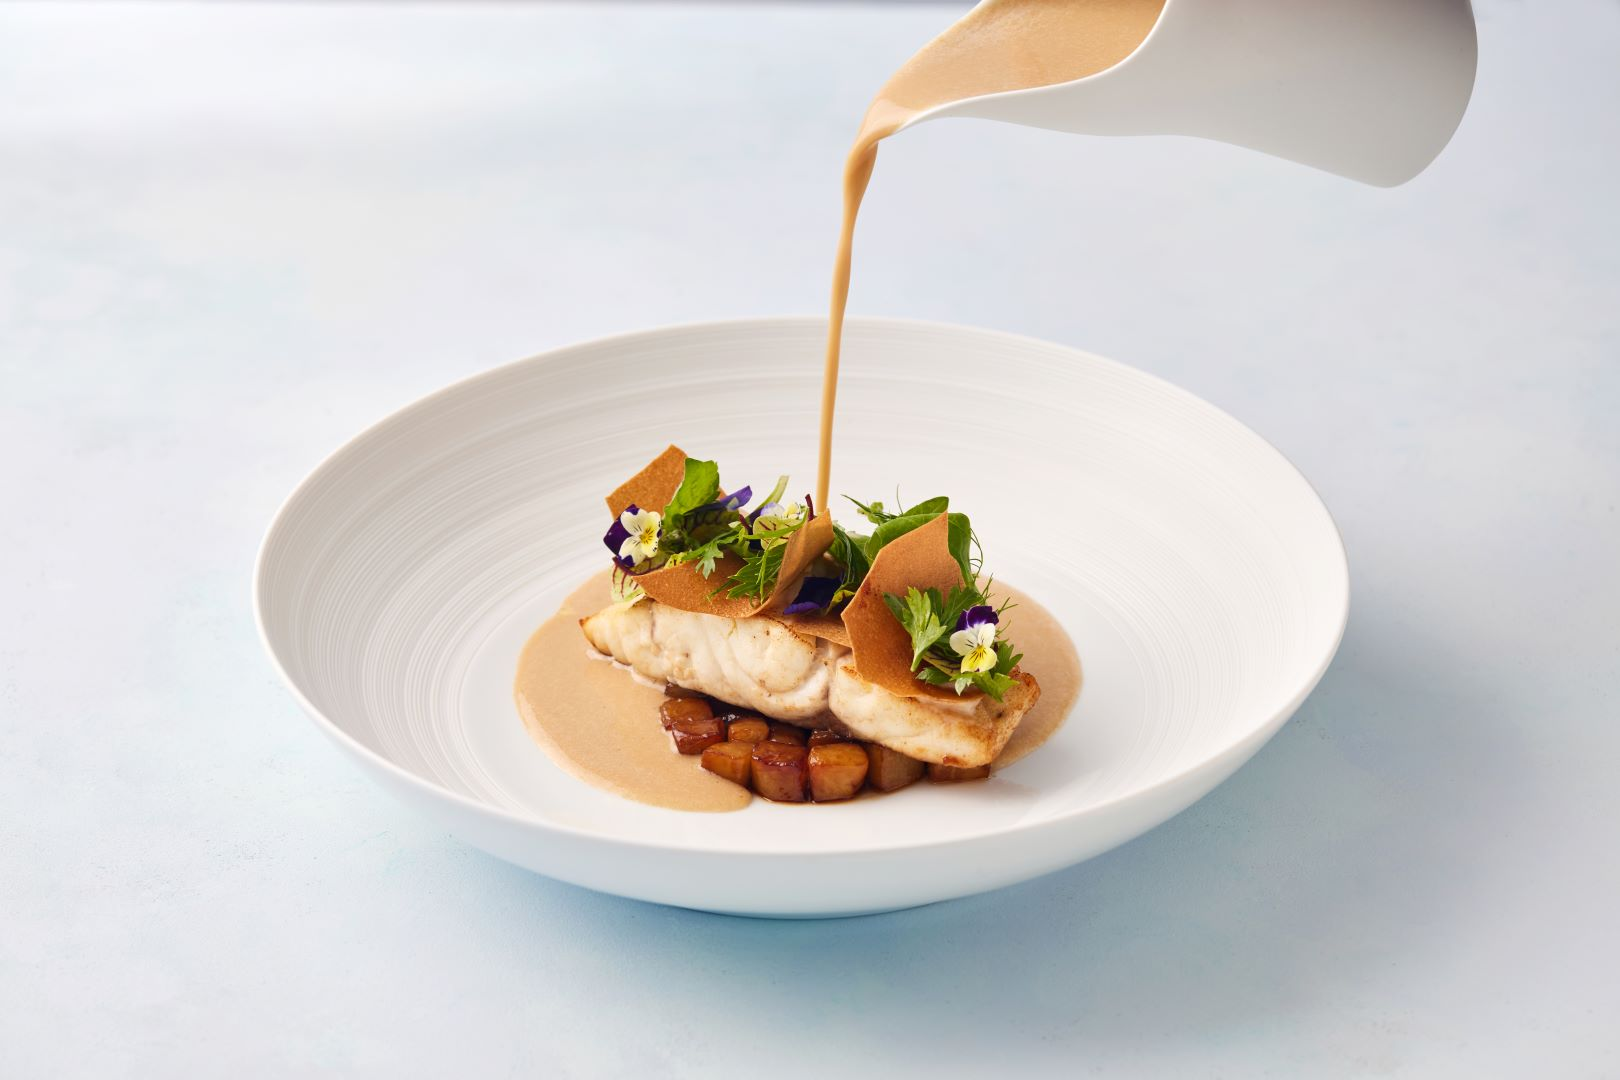 Dish at Mutaha Restaurant at Jumeirah Burj Al Arab